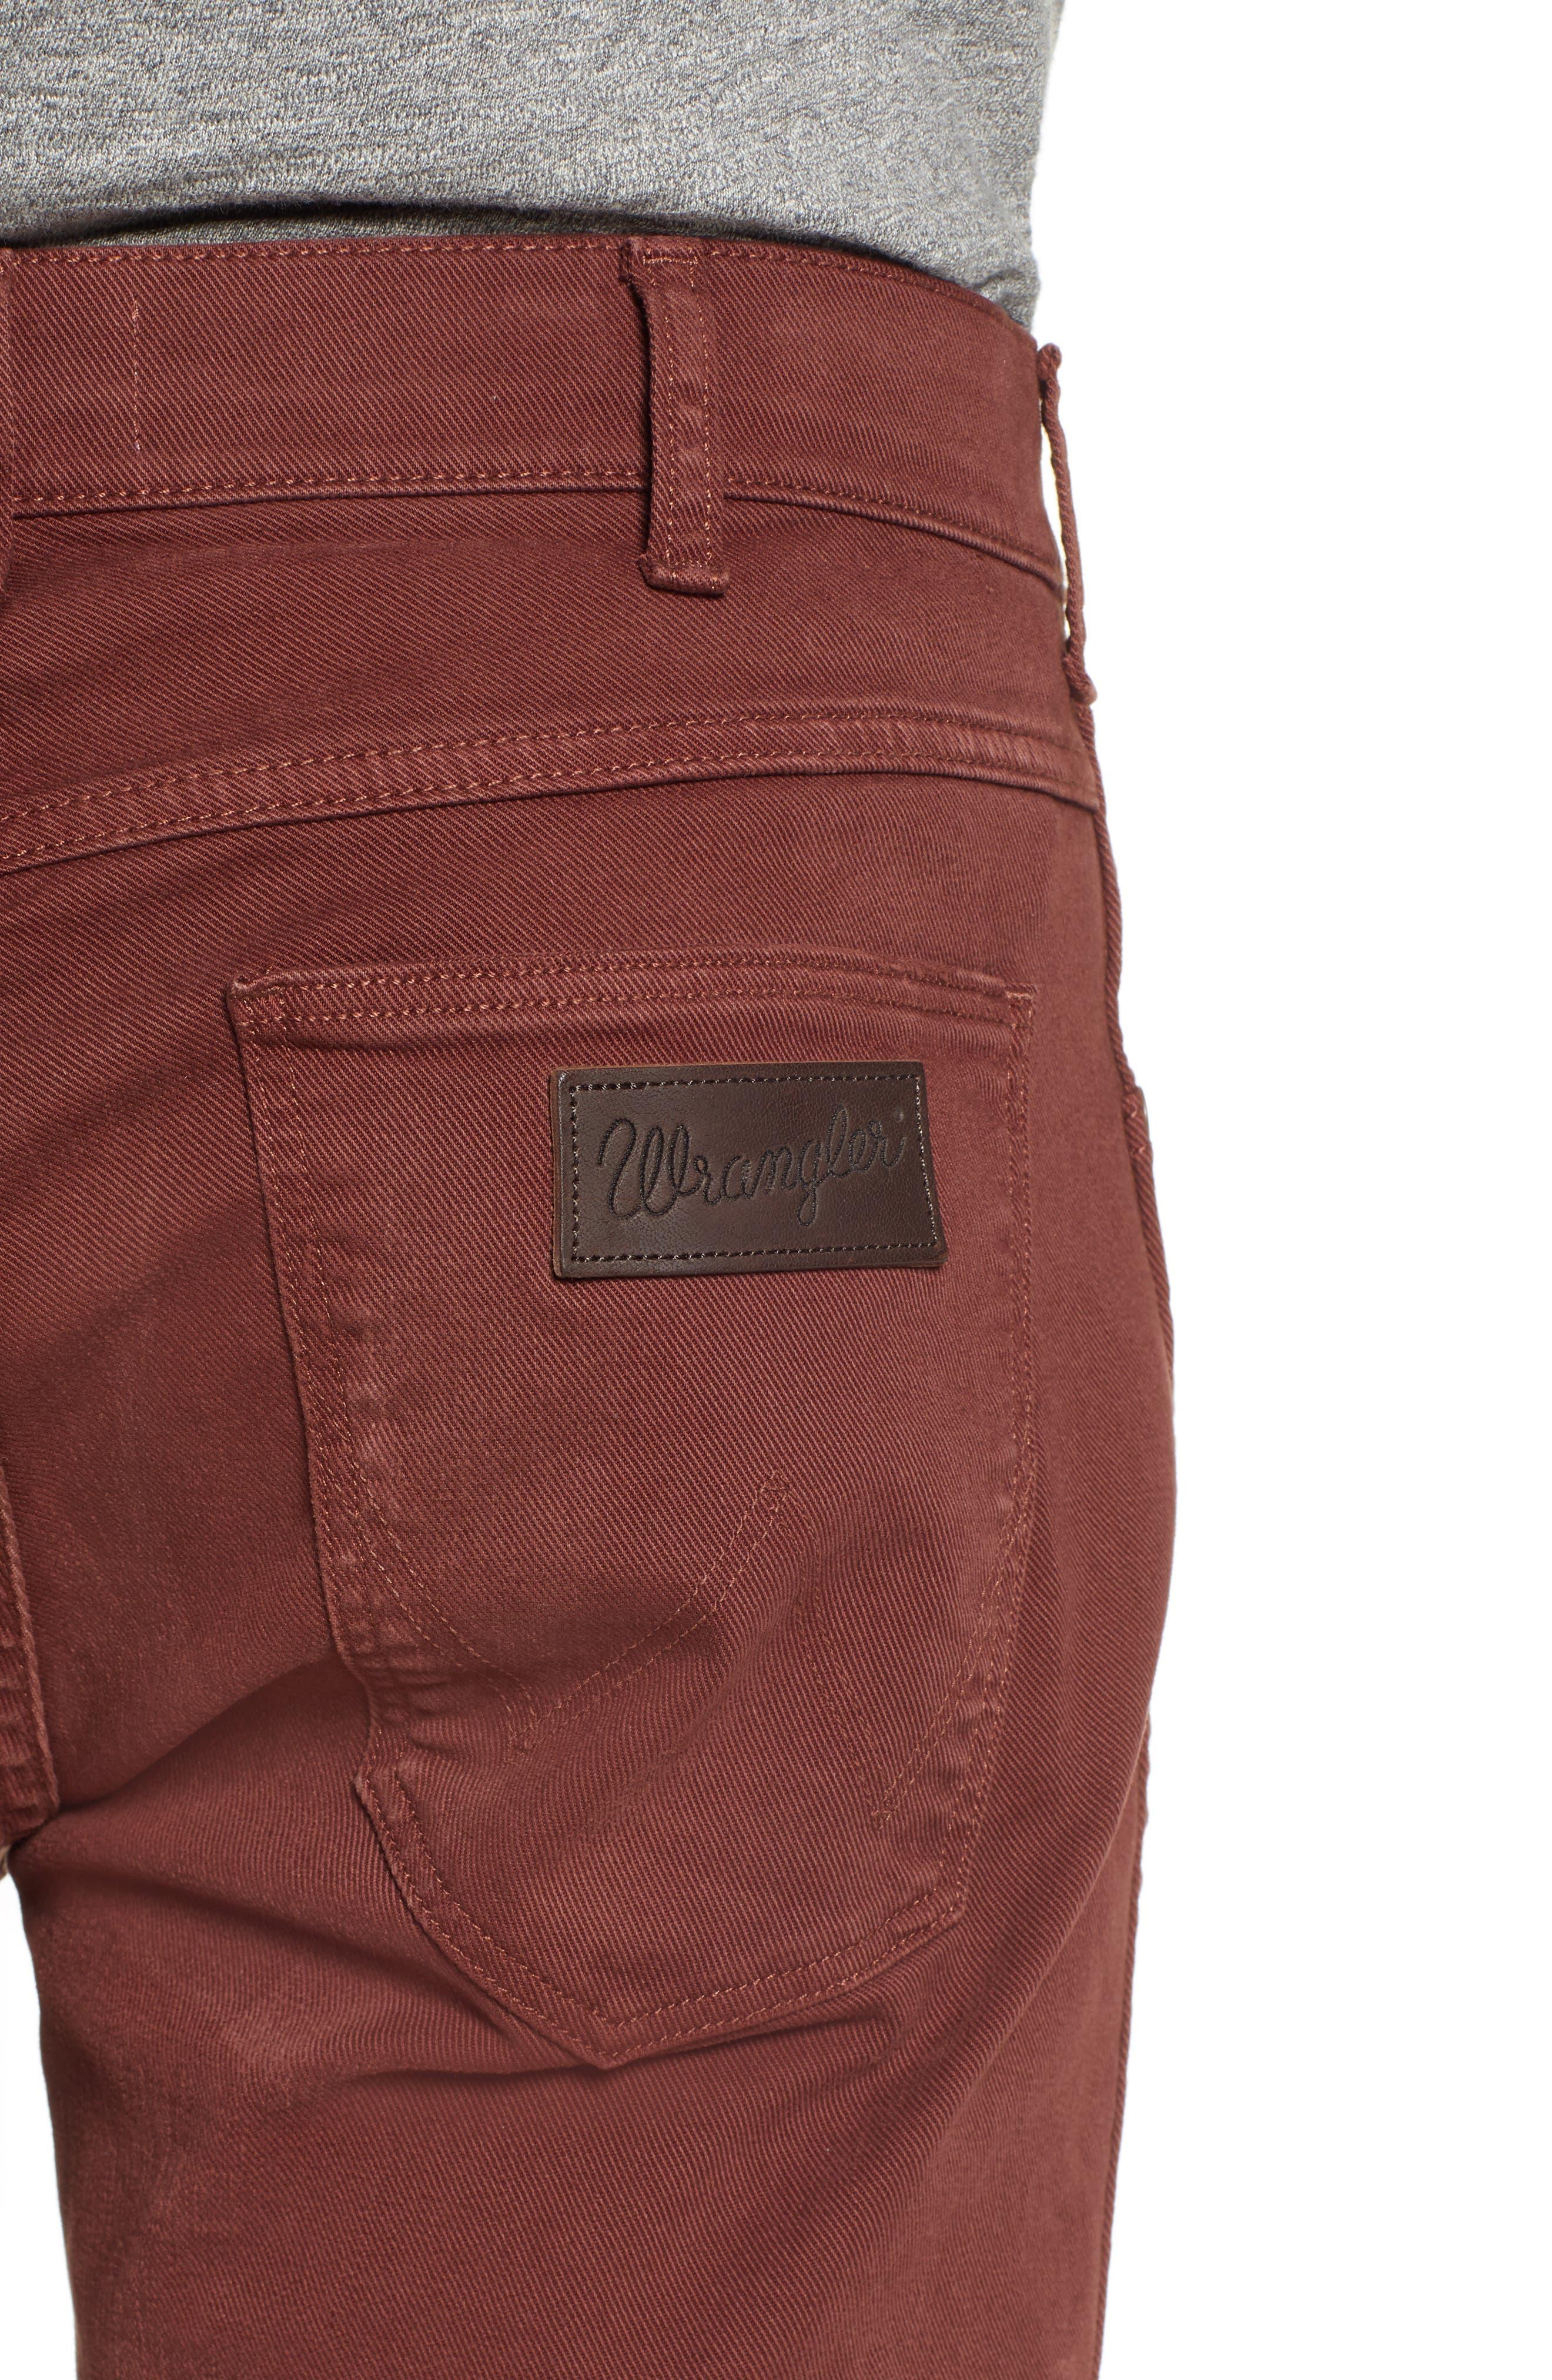 Greensboro Straight Leg Twill Pants,                             Alternate thumbnail 4, color,                             MAHOGANY RED